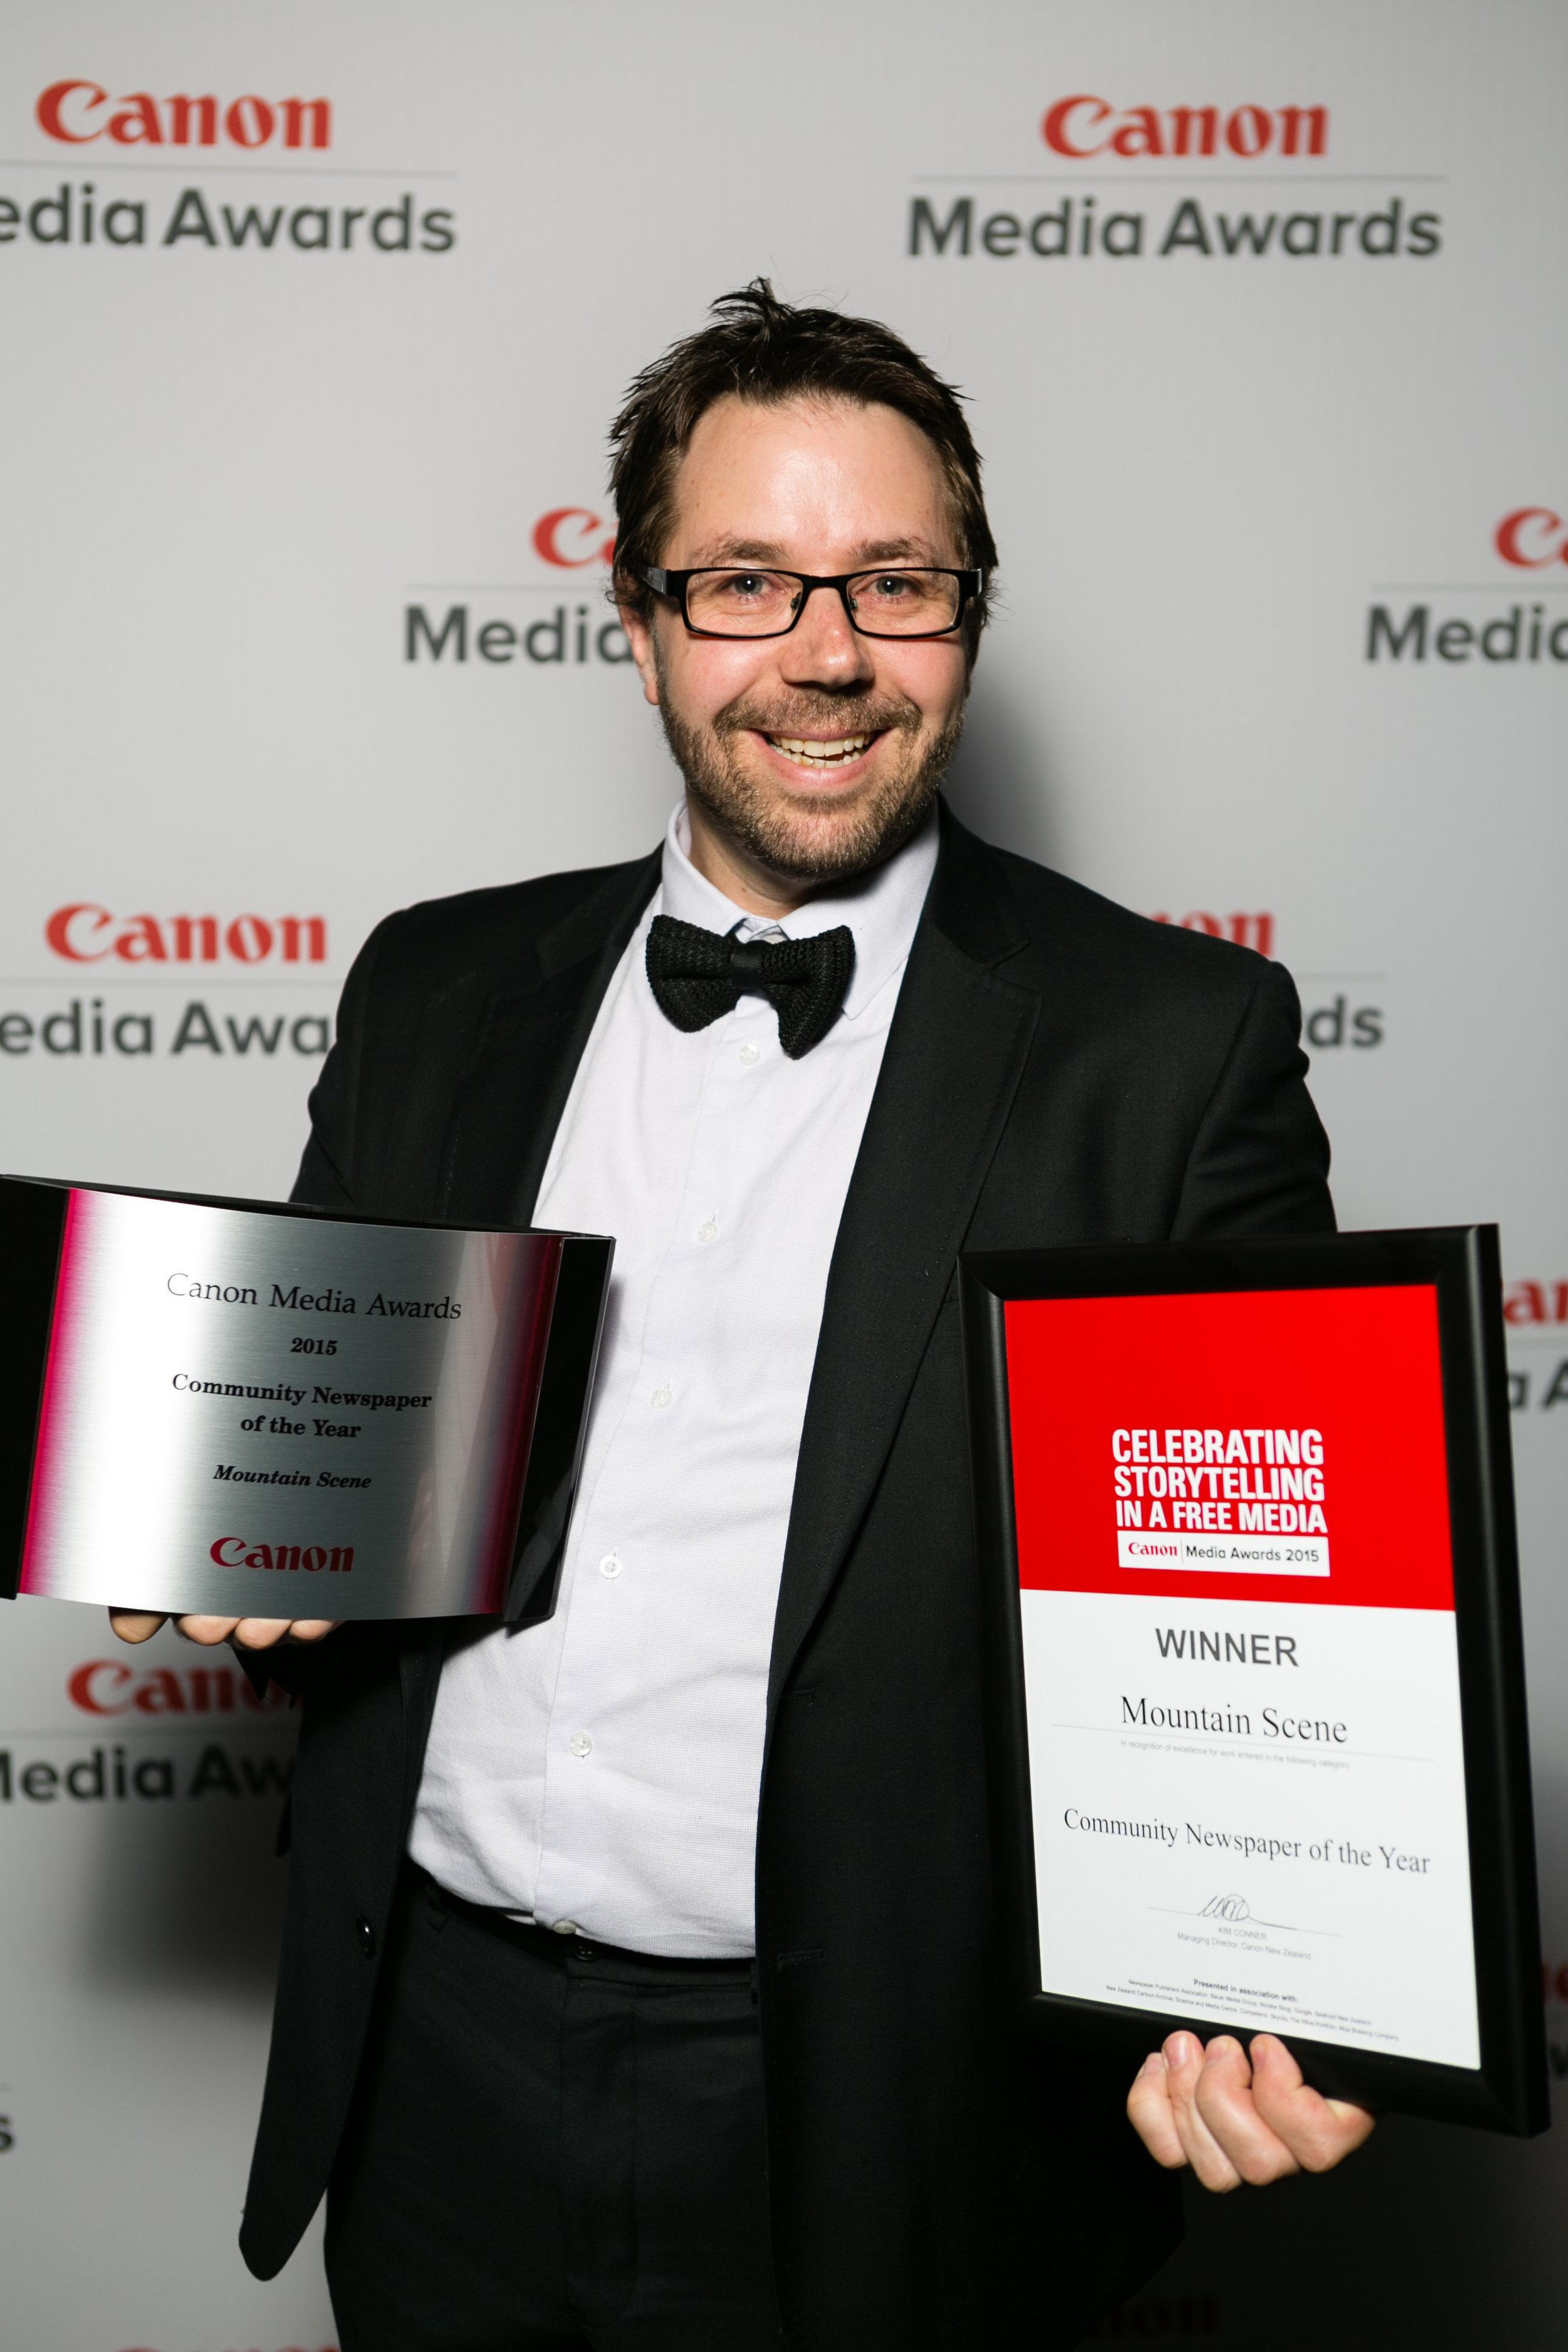 canon_media_awards_2015_interlike_nz_clinton_tudor-6032-226.jpg